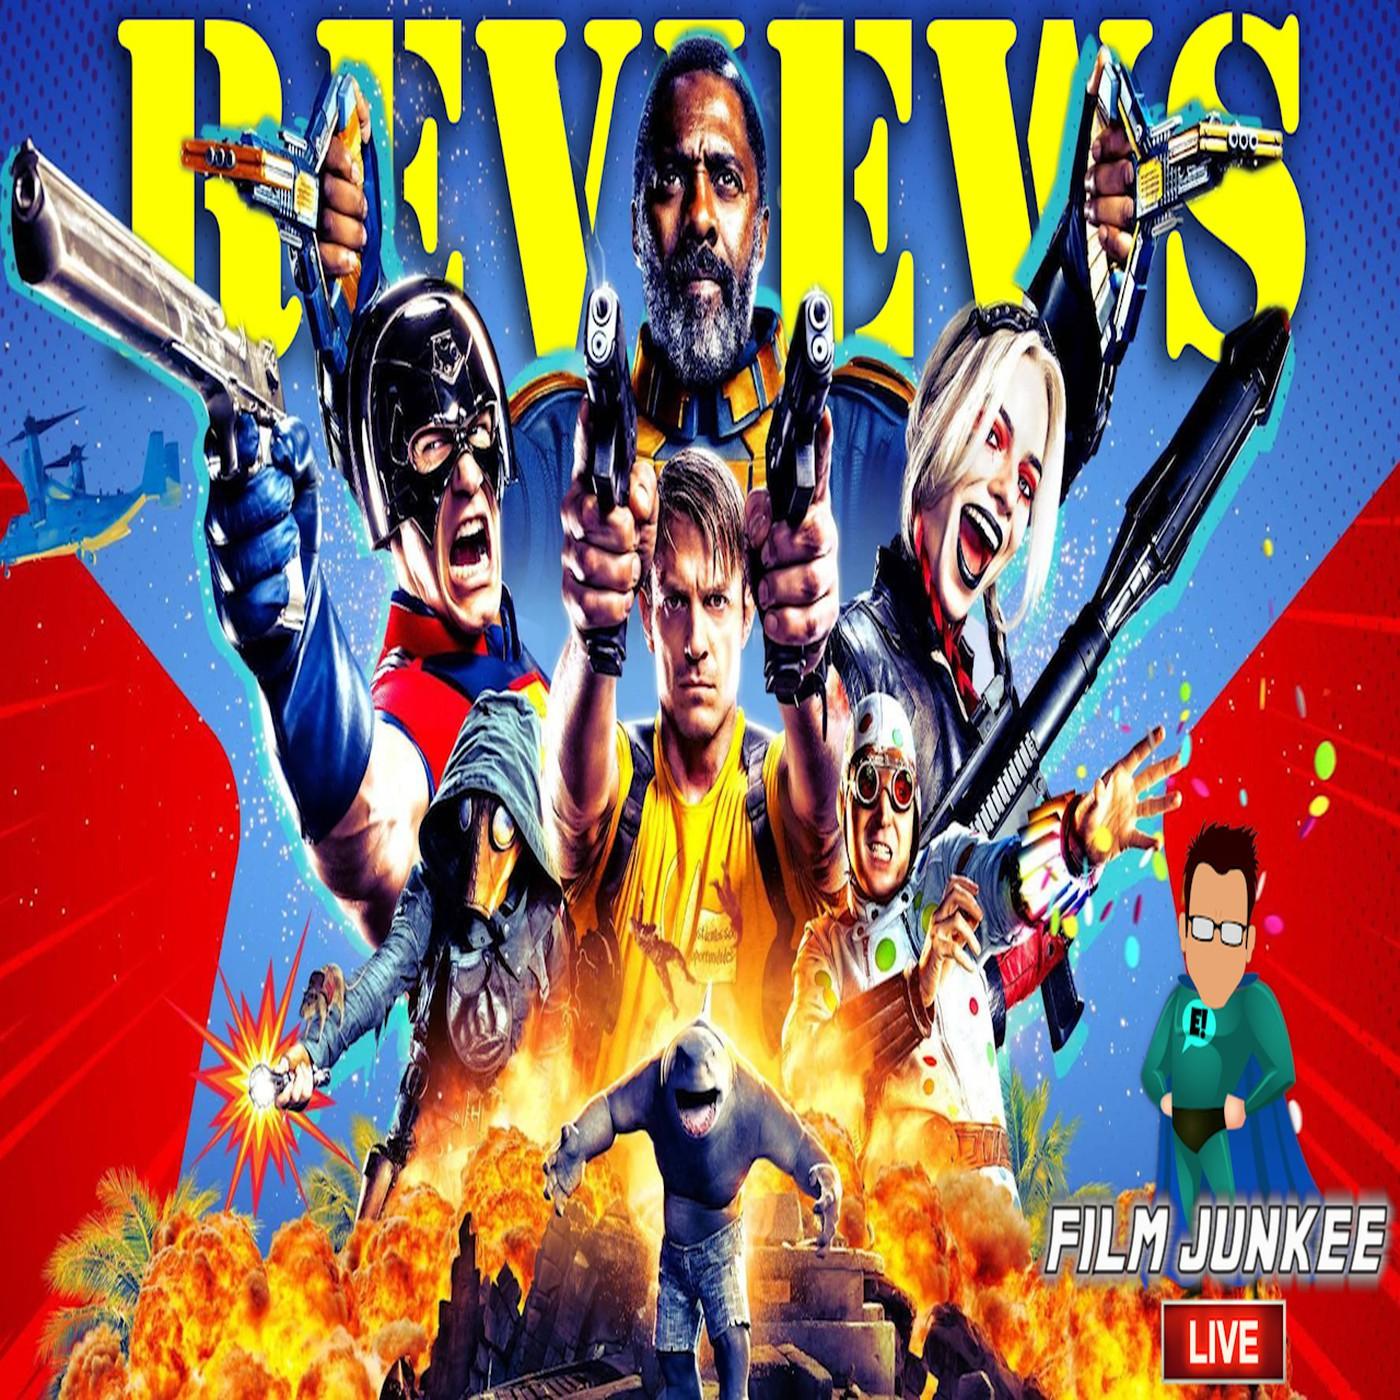 THE FILM JUNKEE